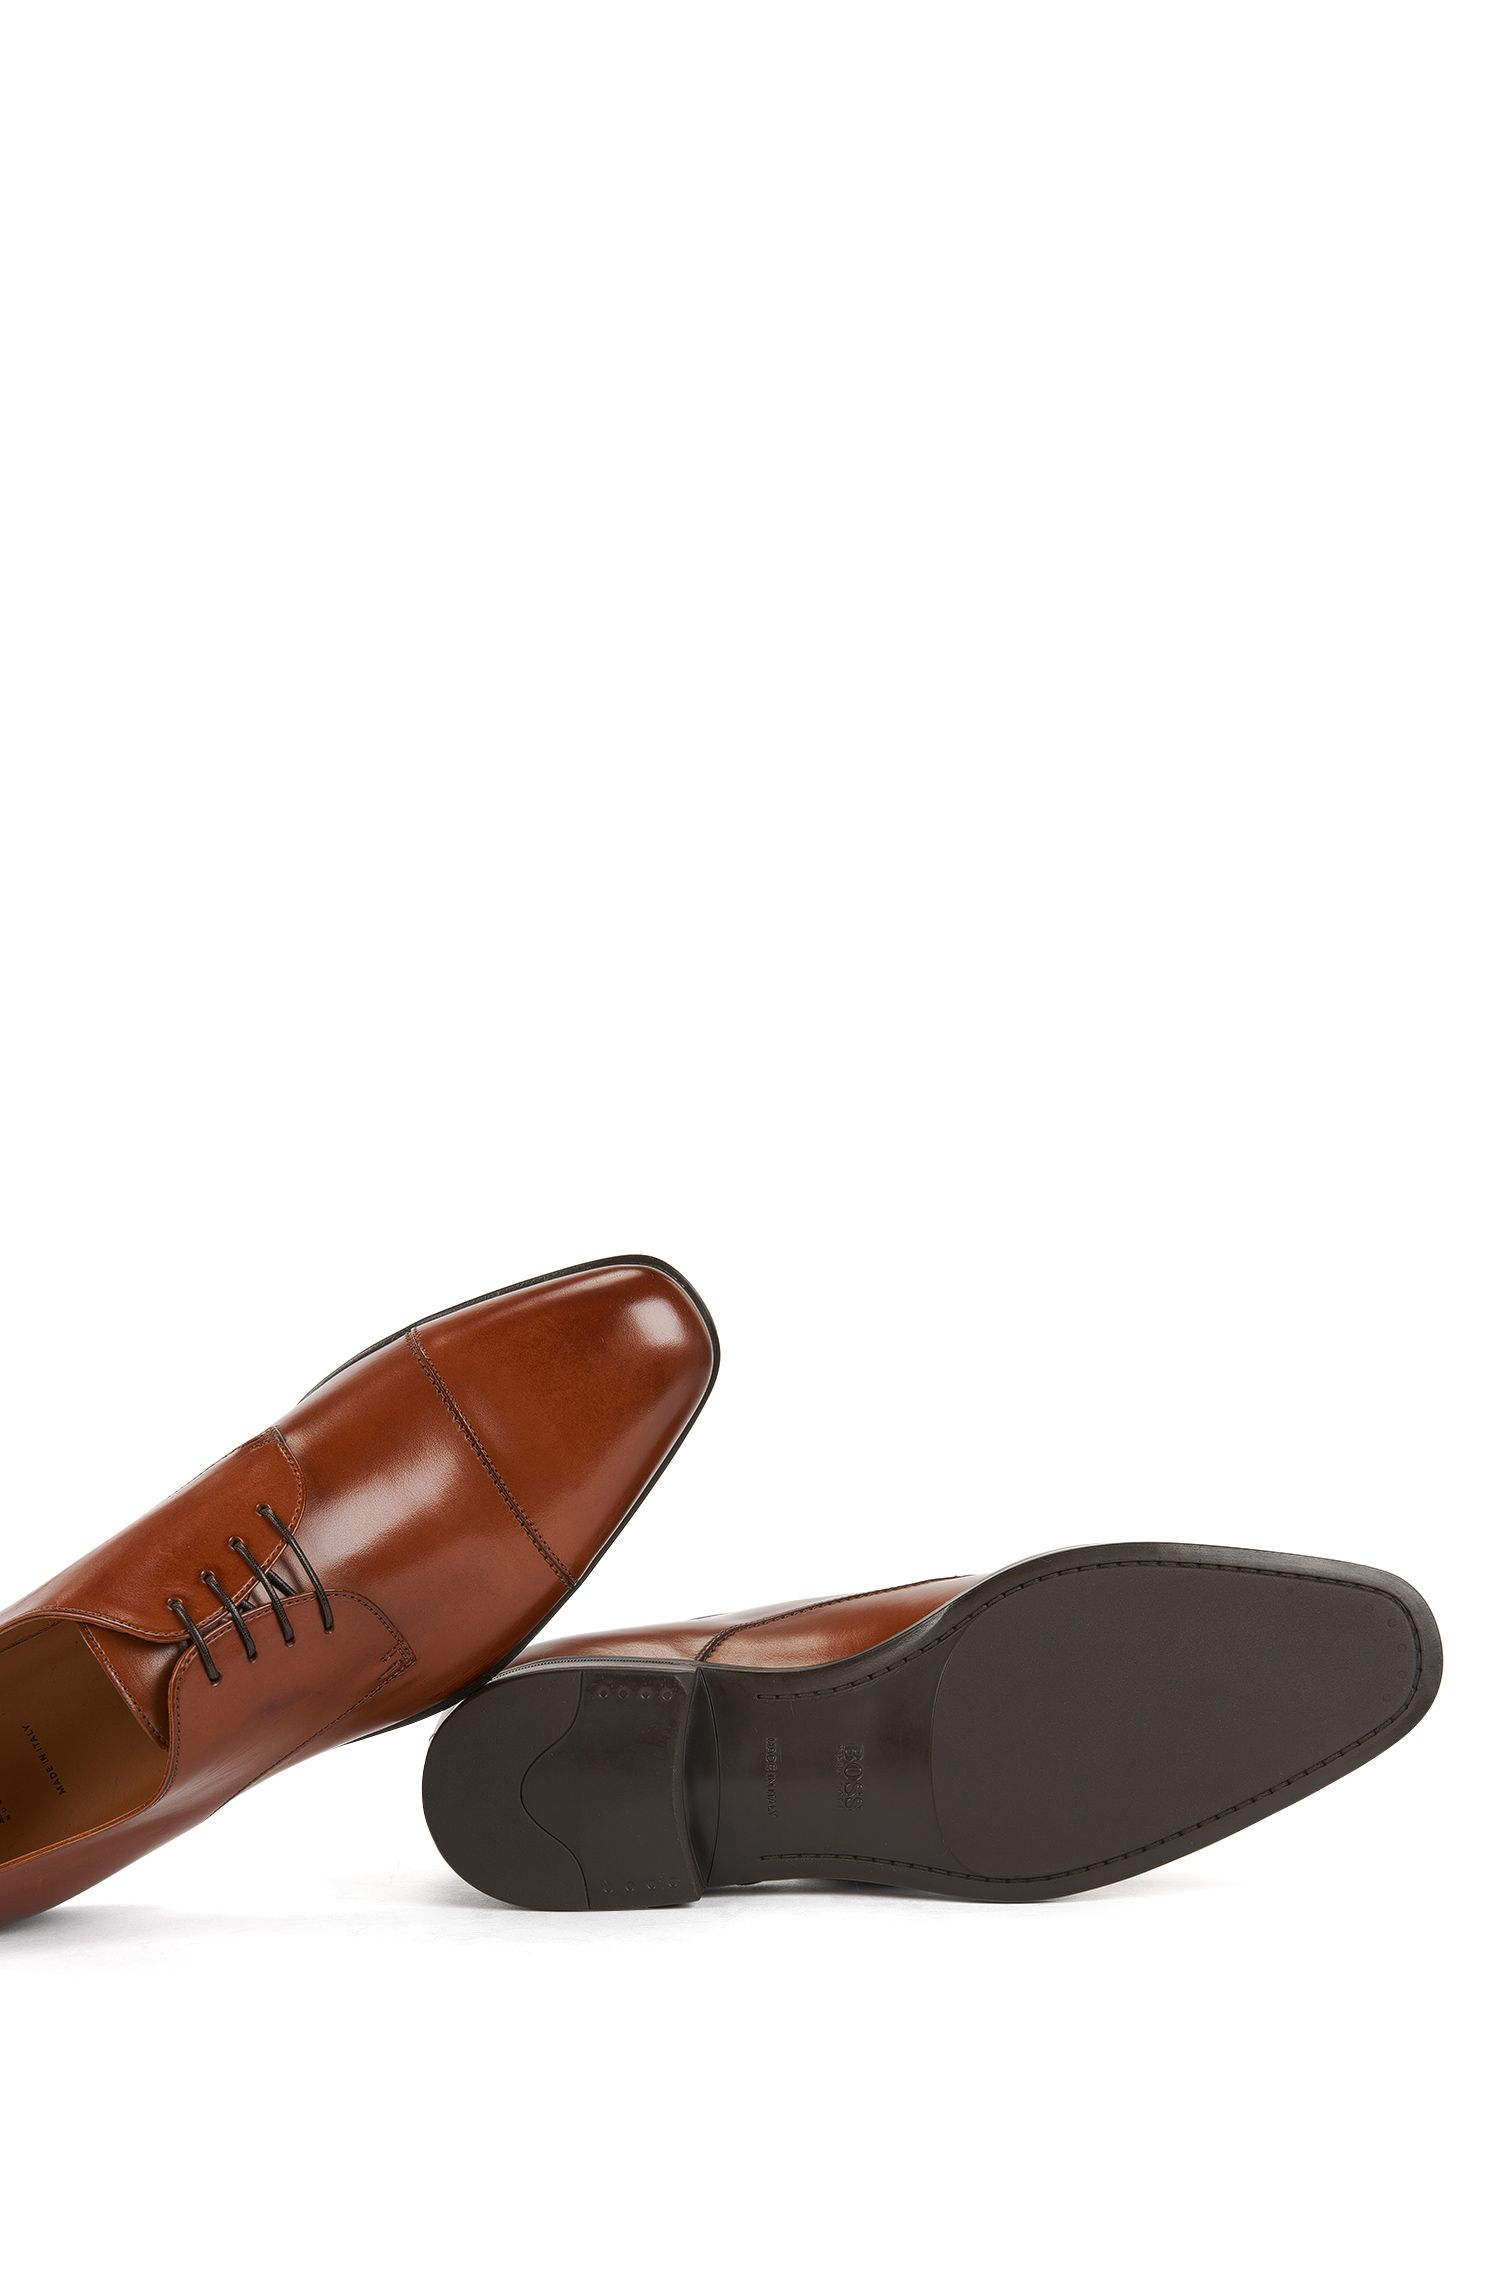 Cap-Toe Derby Shoe | Kensington, Brown